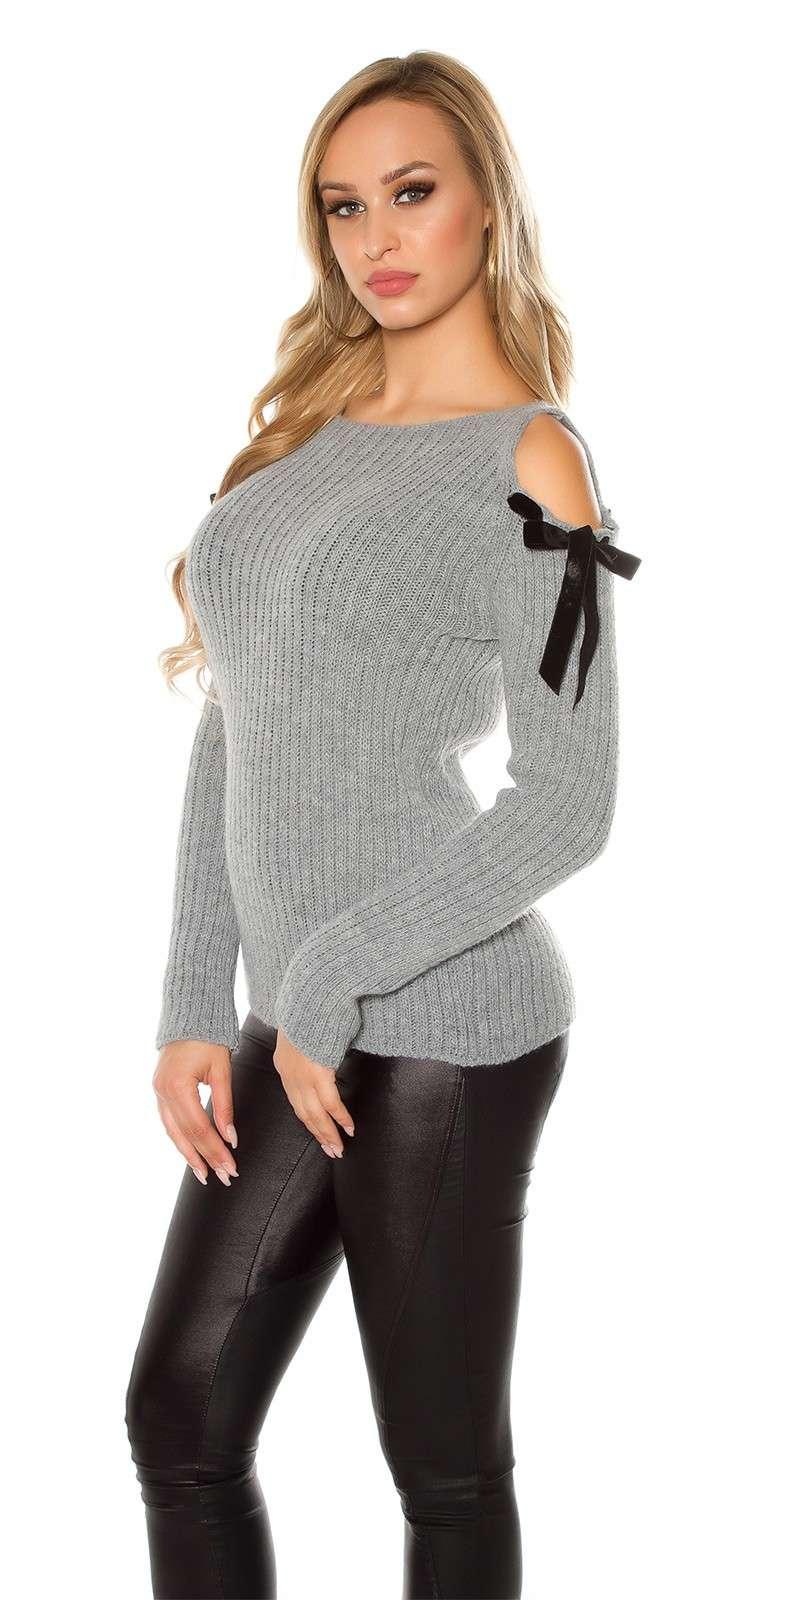 grobstrick pulli pullover sweatshirt grau. Black Bedroom Furniture Sets. Home Design Ideas